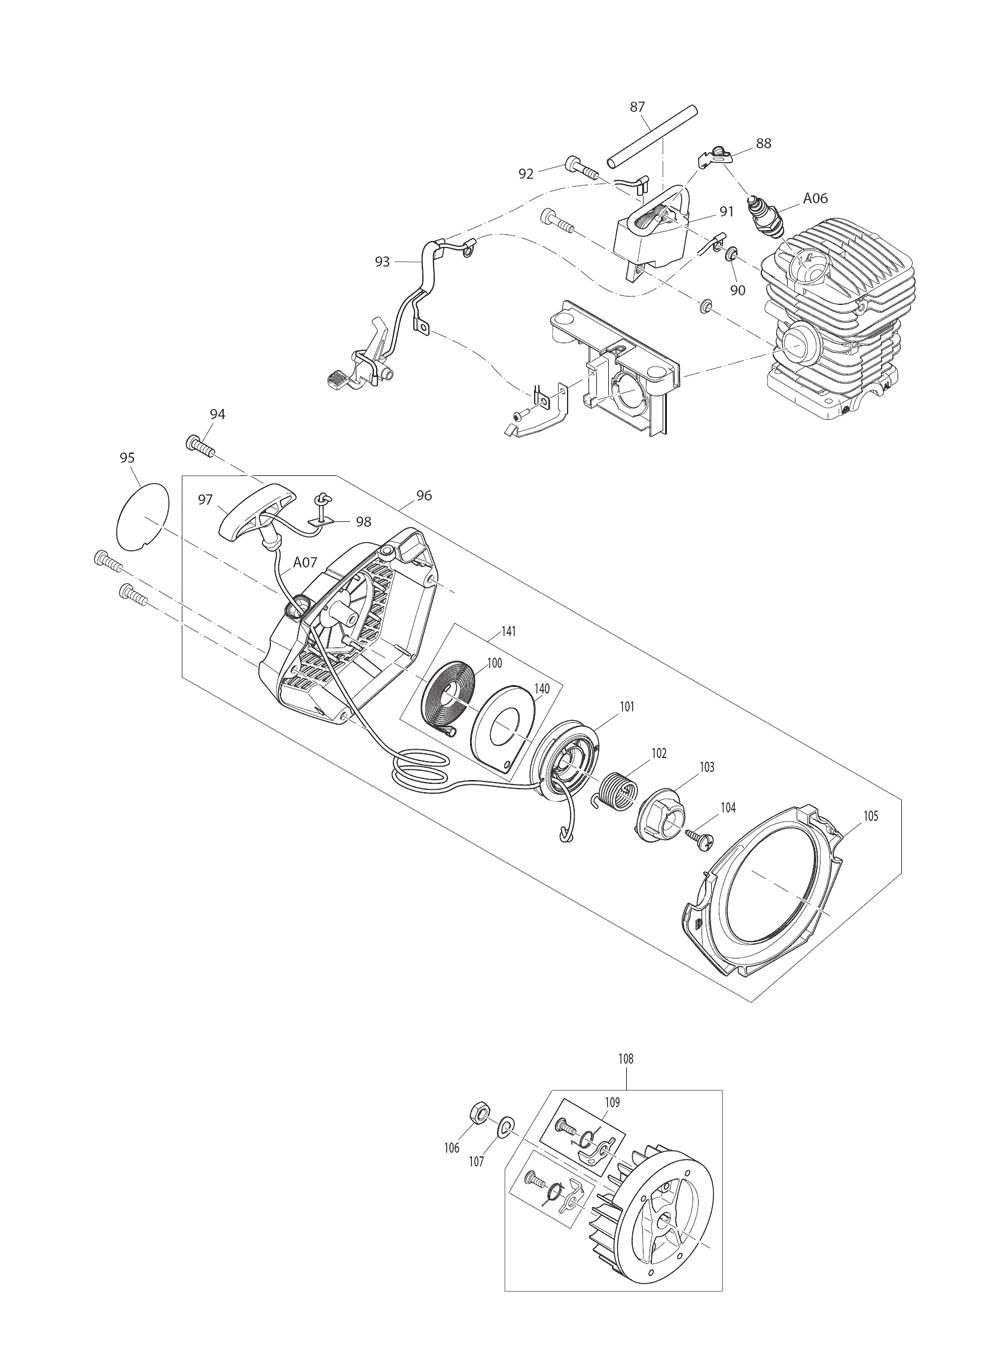 EA3201S40B-T3-Makita-PB-3Break Down